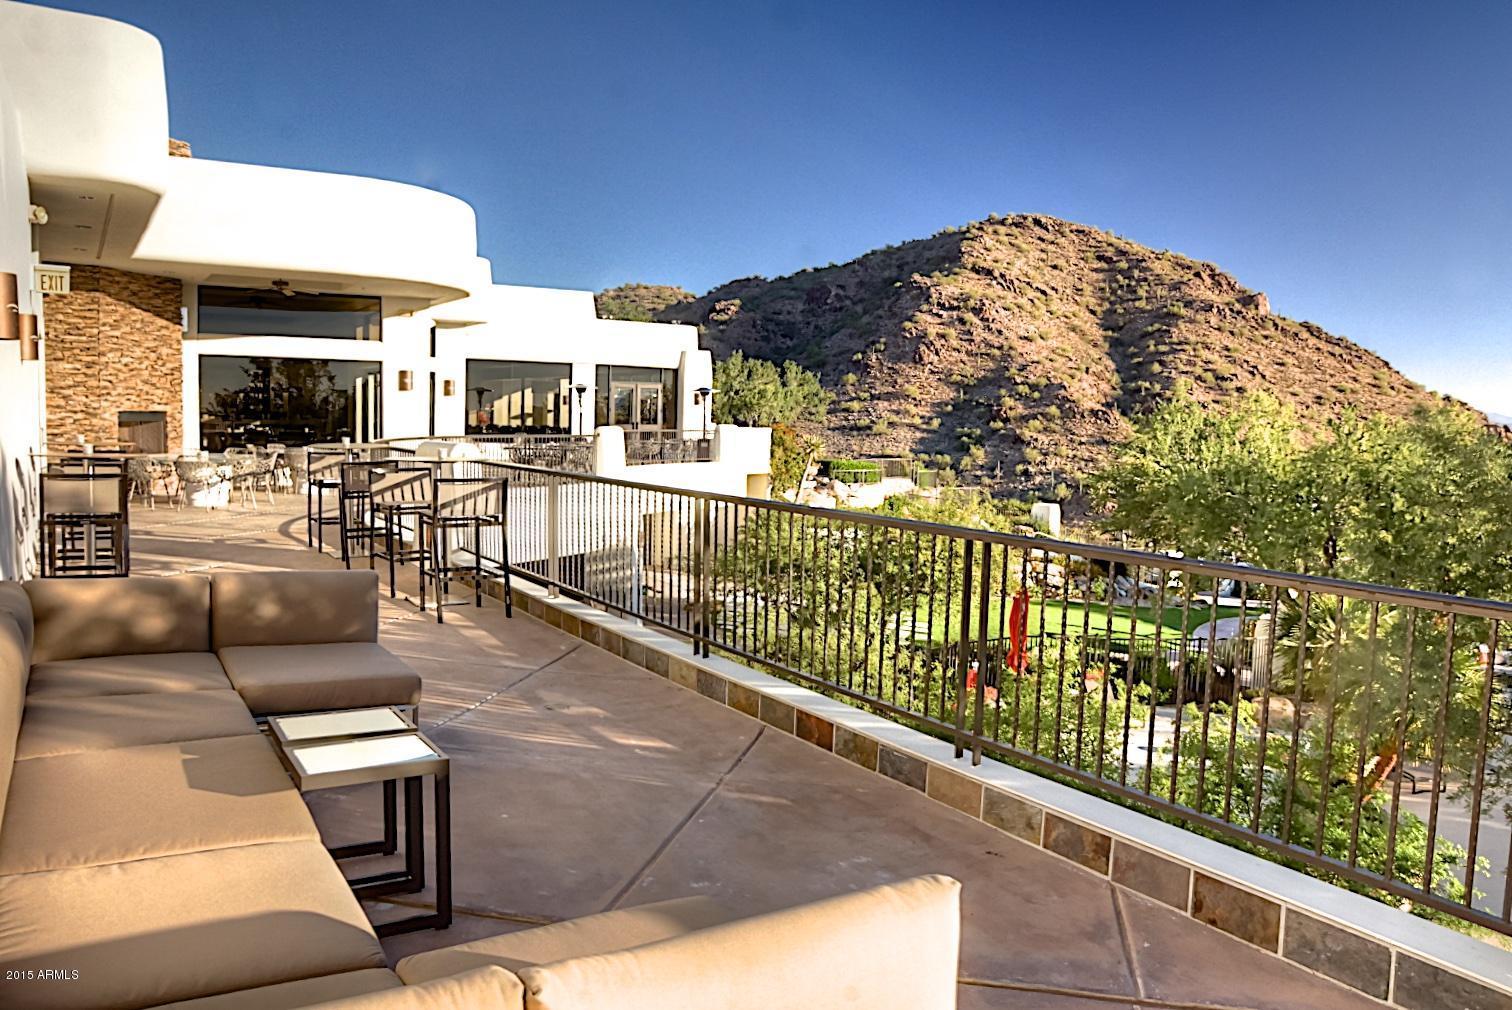 14850 E GRANDVIEW Drive Unit 251 Fountain Hills, AZ 85268 - MLS #: 5220914